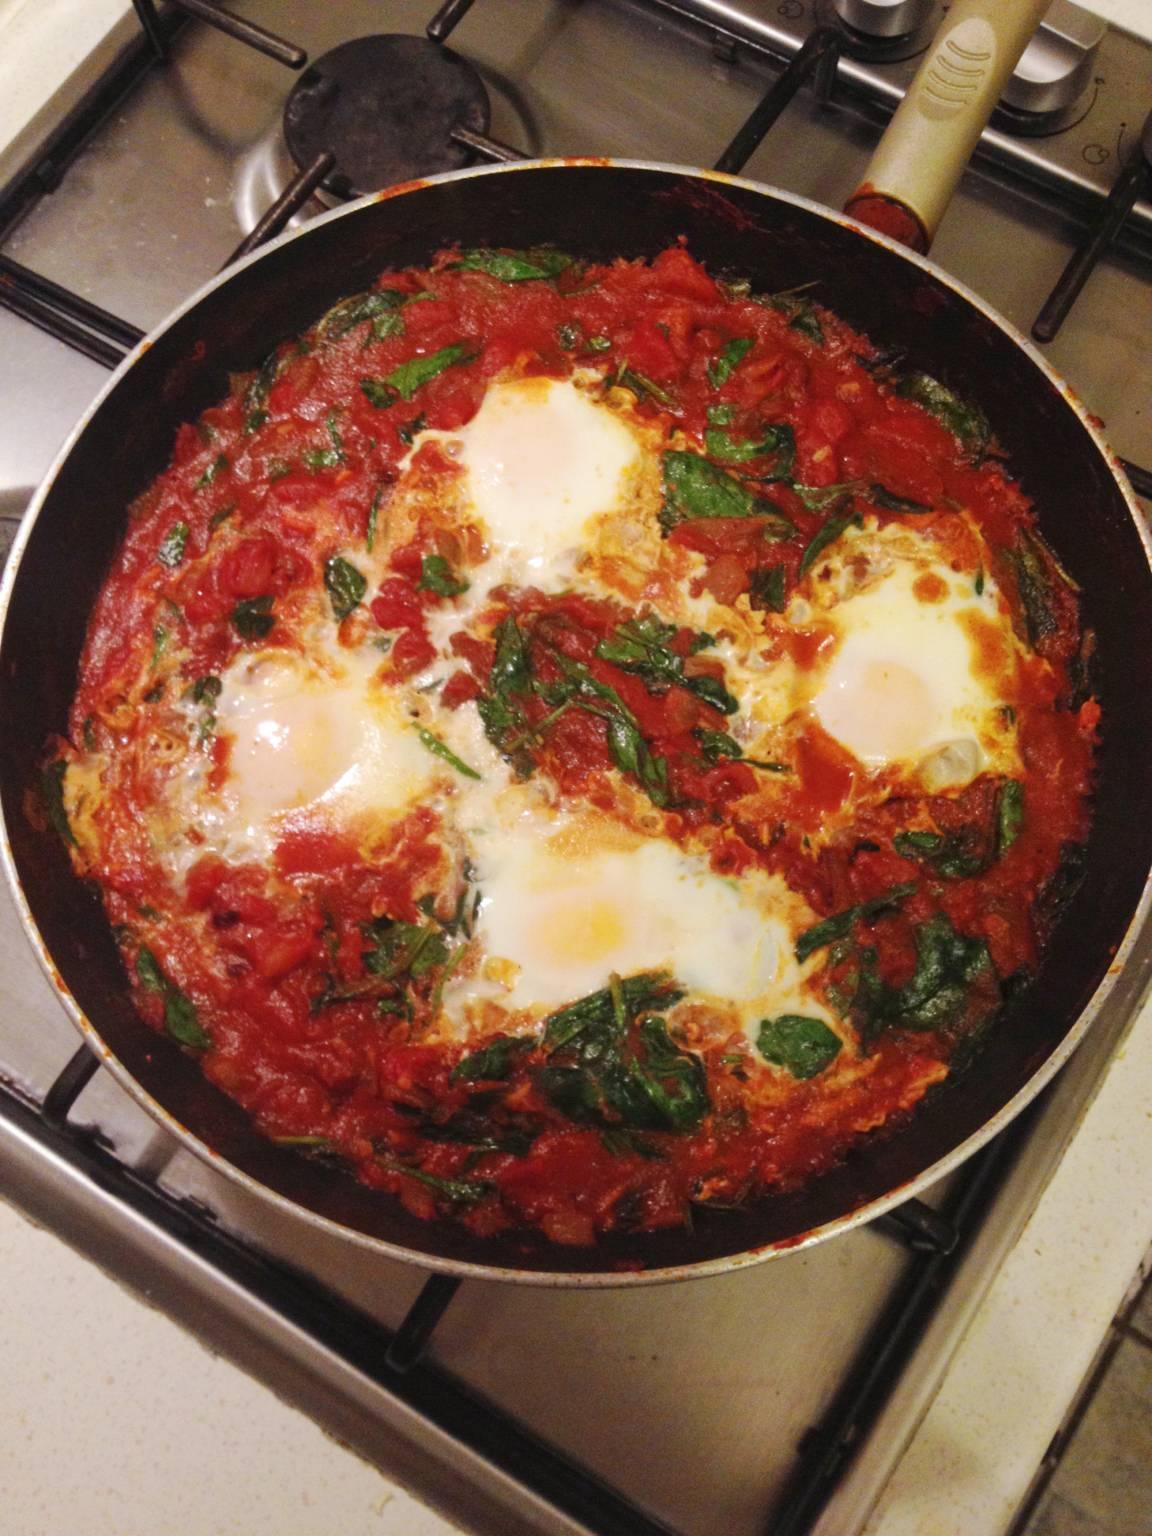 London flatting eggs